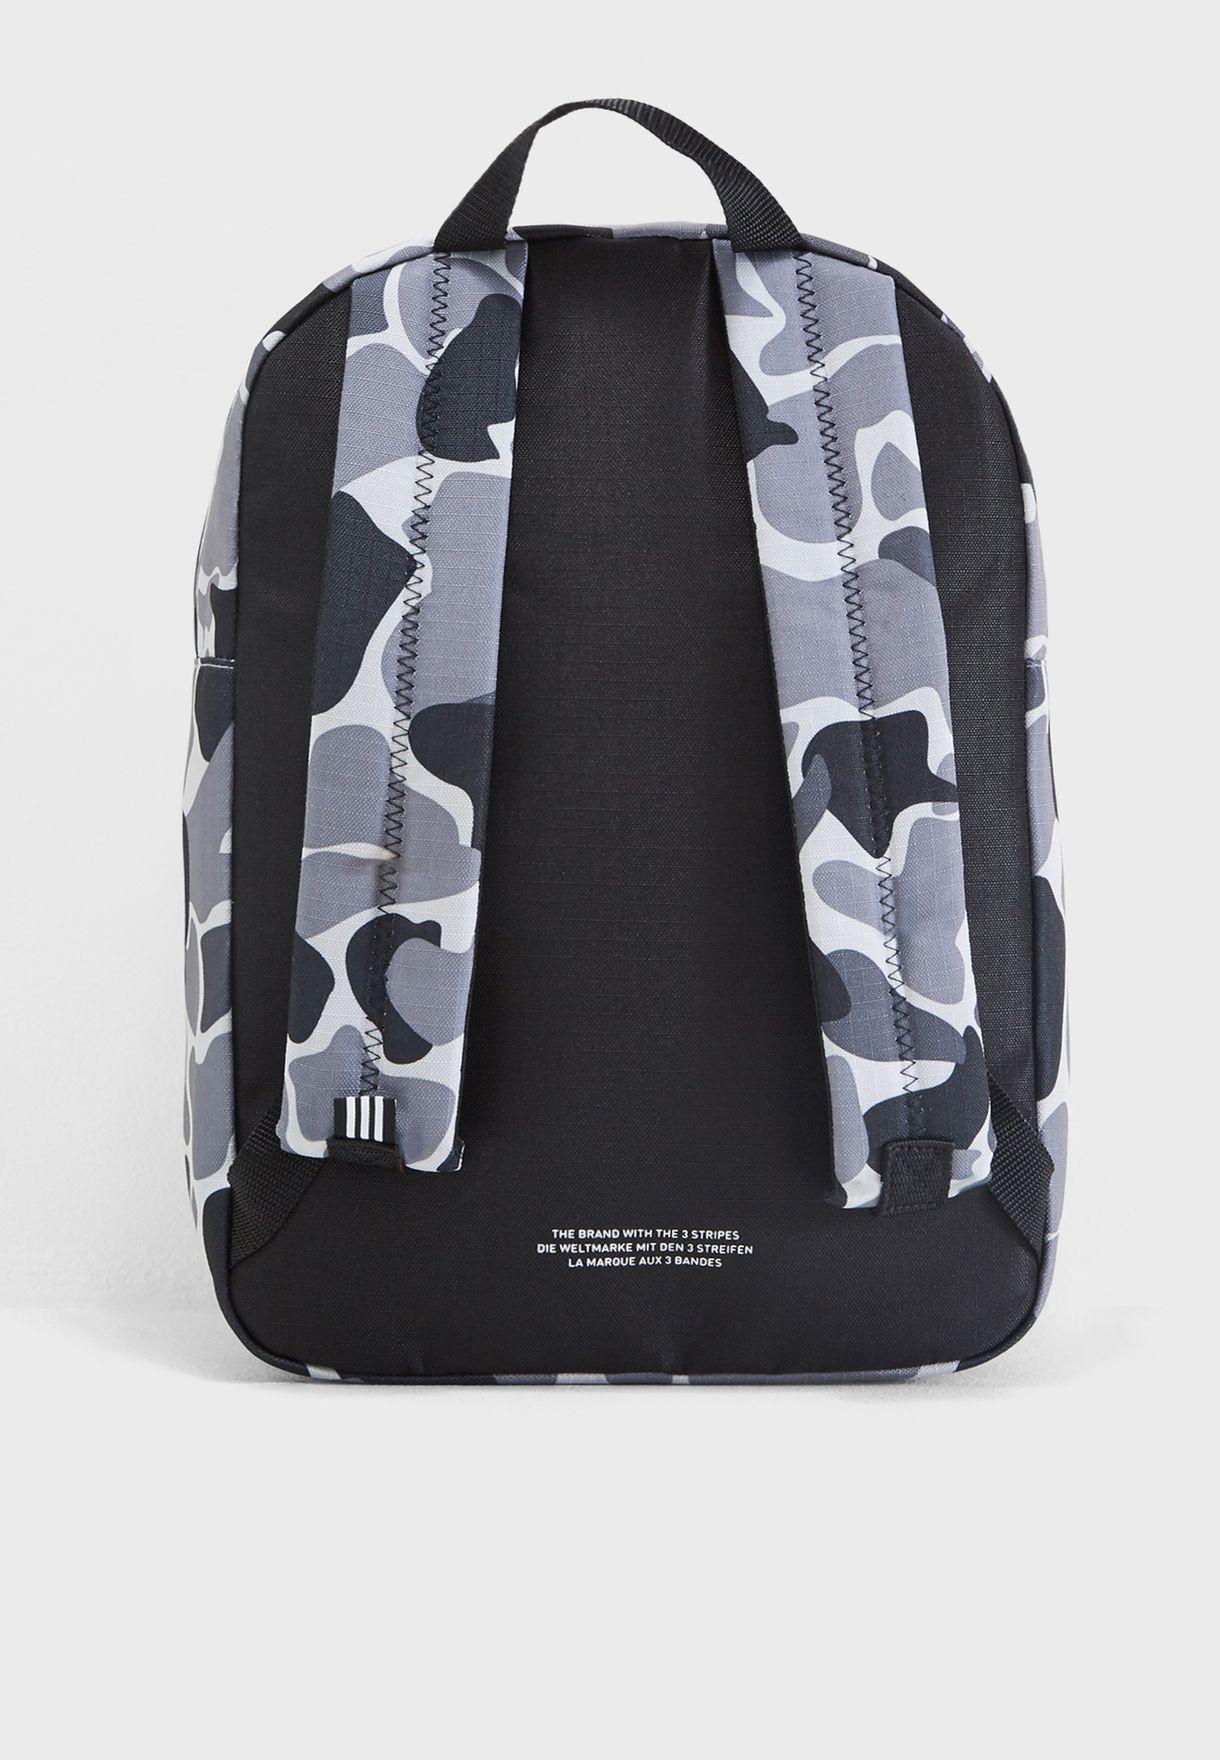 b3b25713b7fc Adidas Originals Blue Backpack Camo